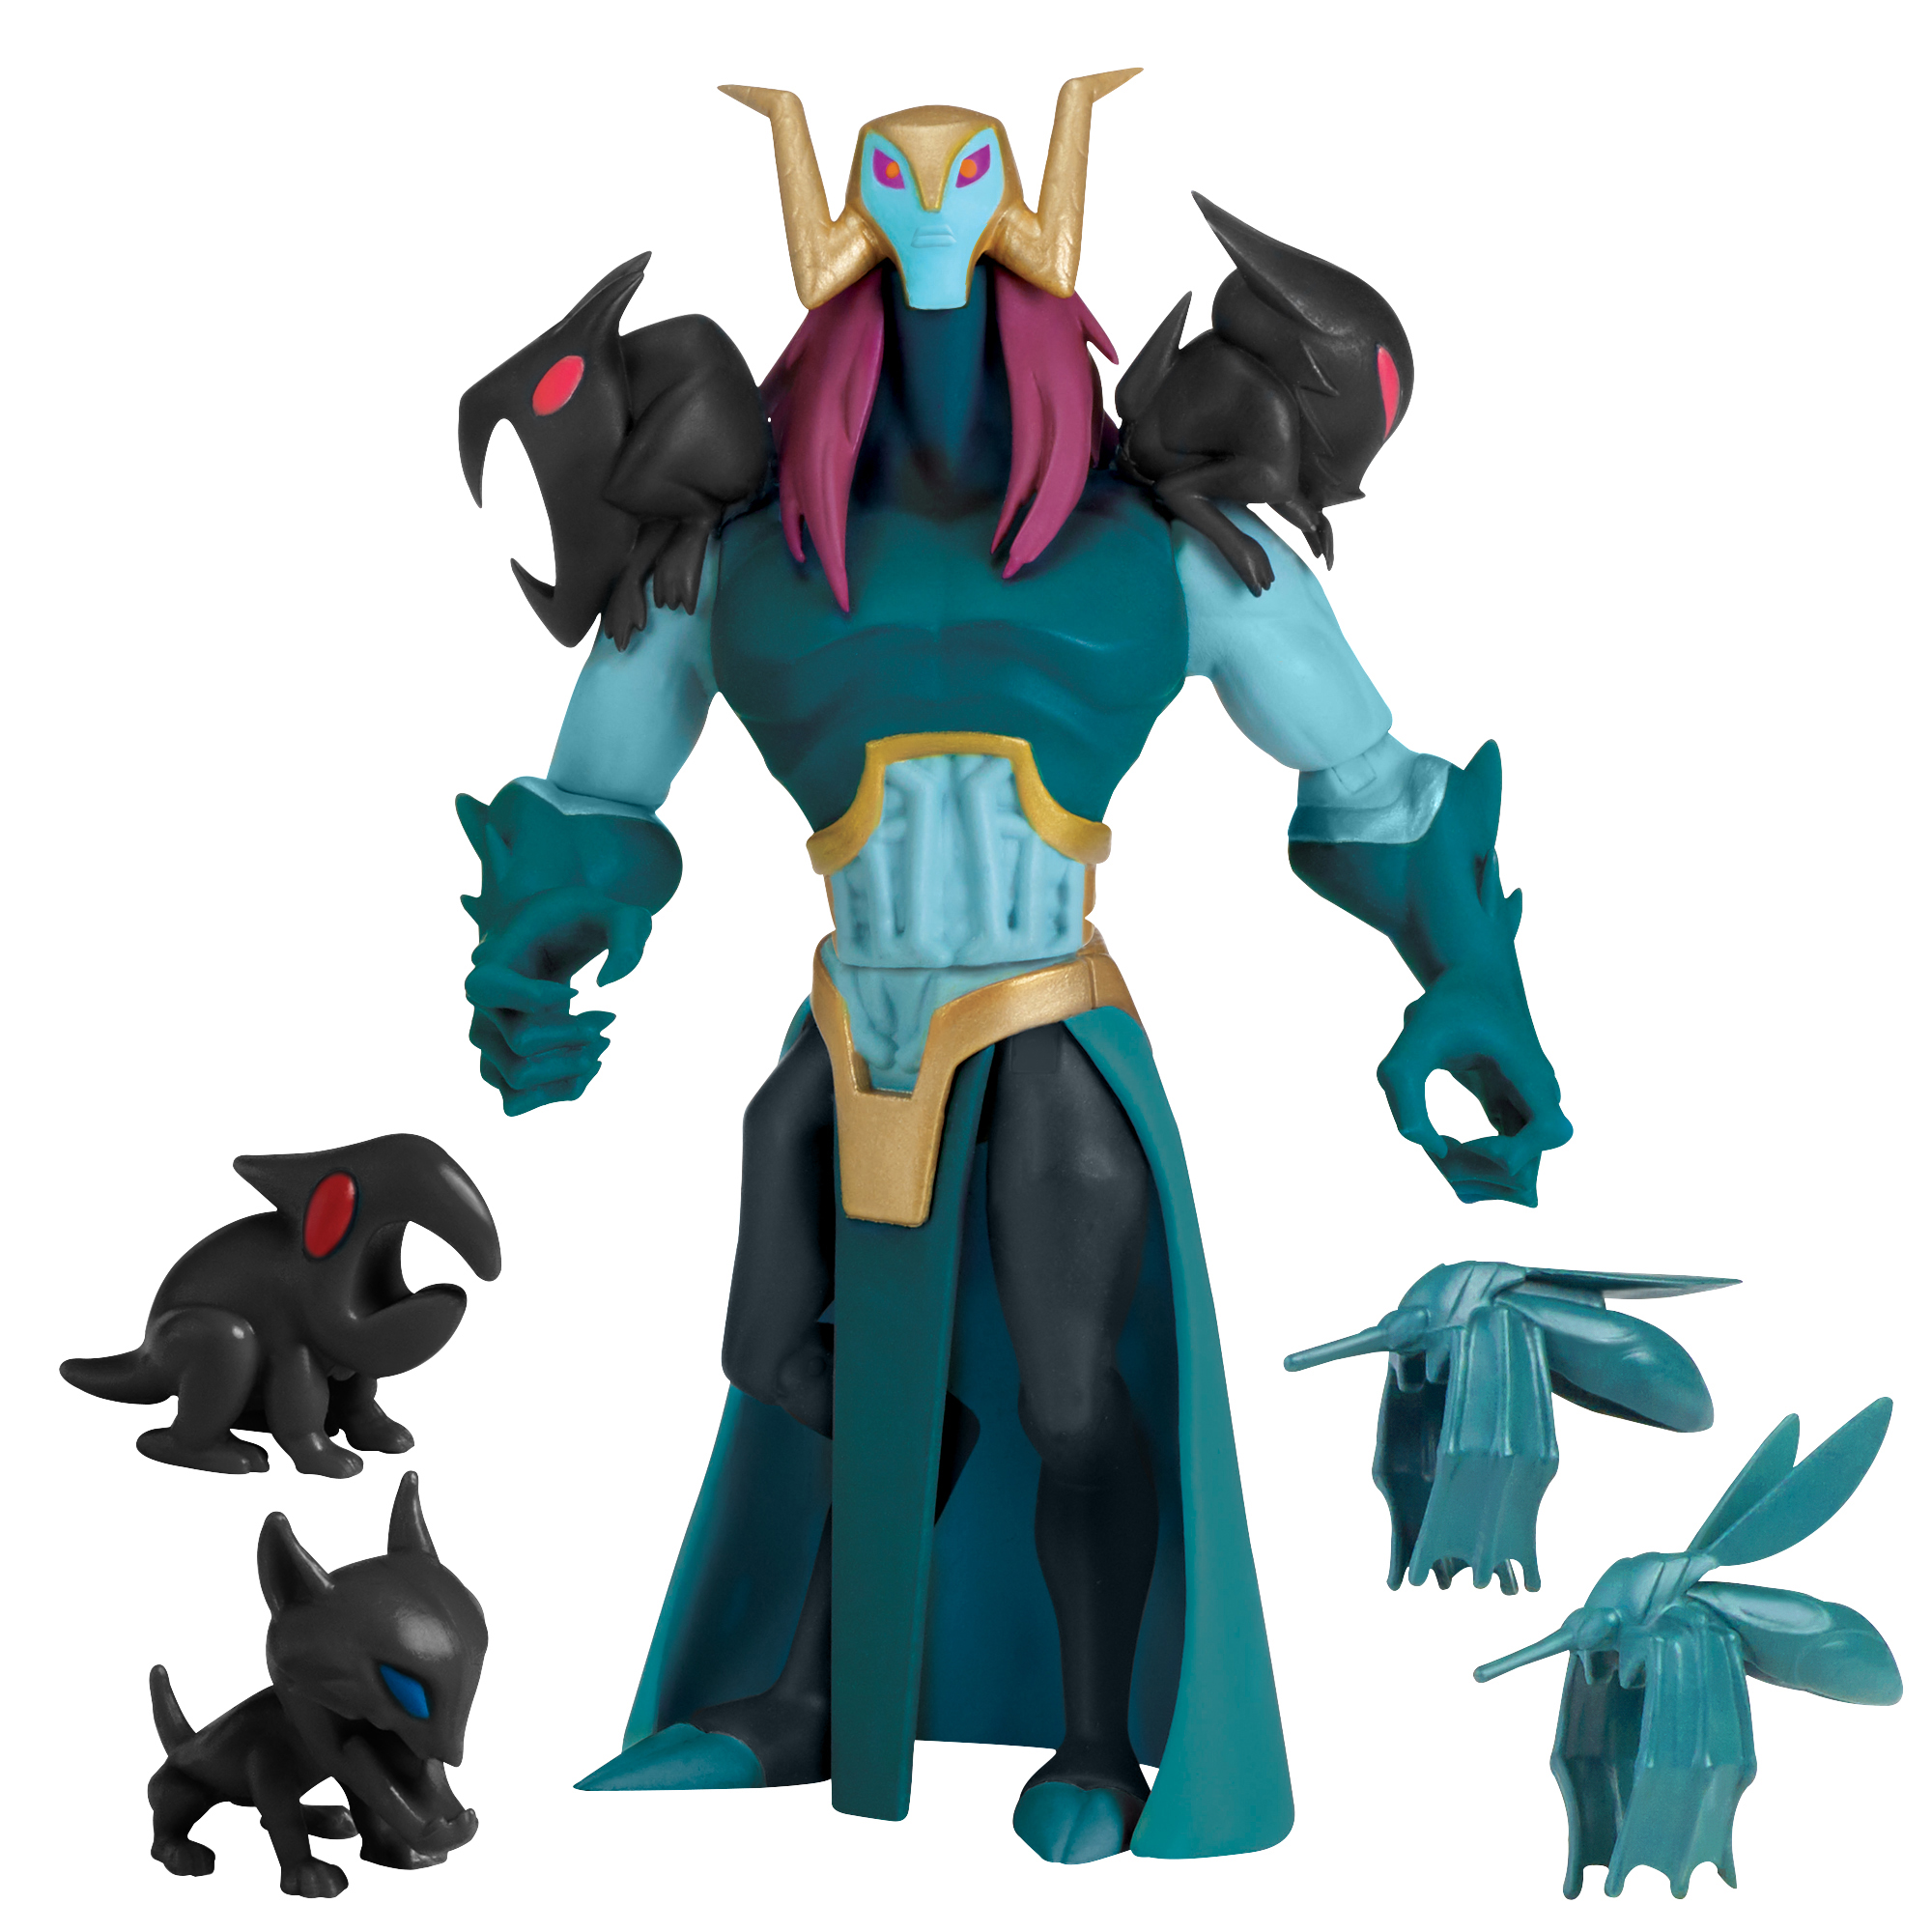 Rise of the Teenage Mutant Ninja Turtle Baron Draxum Action Figure